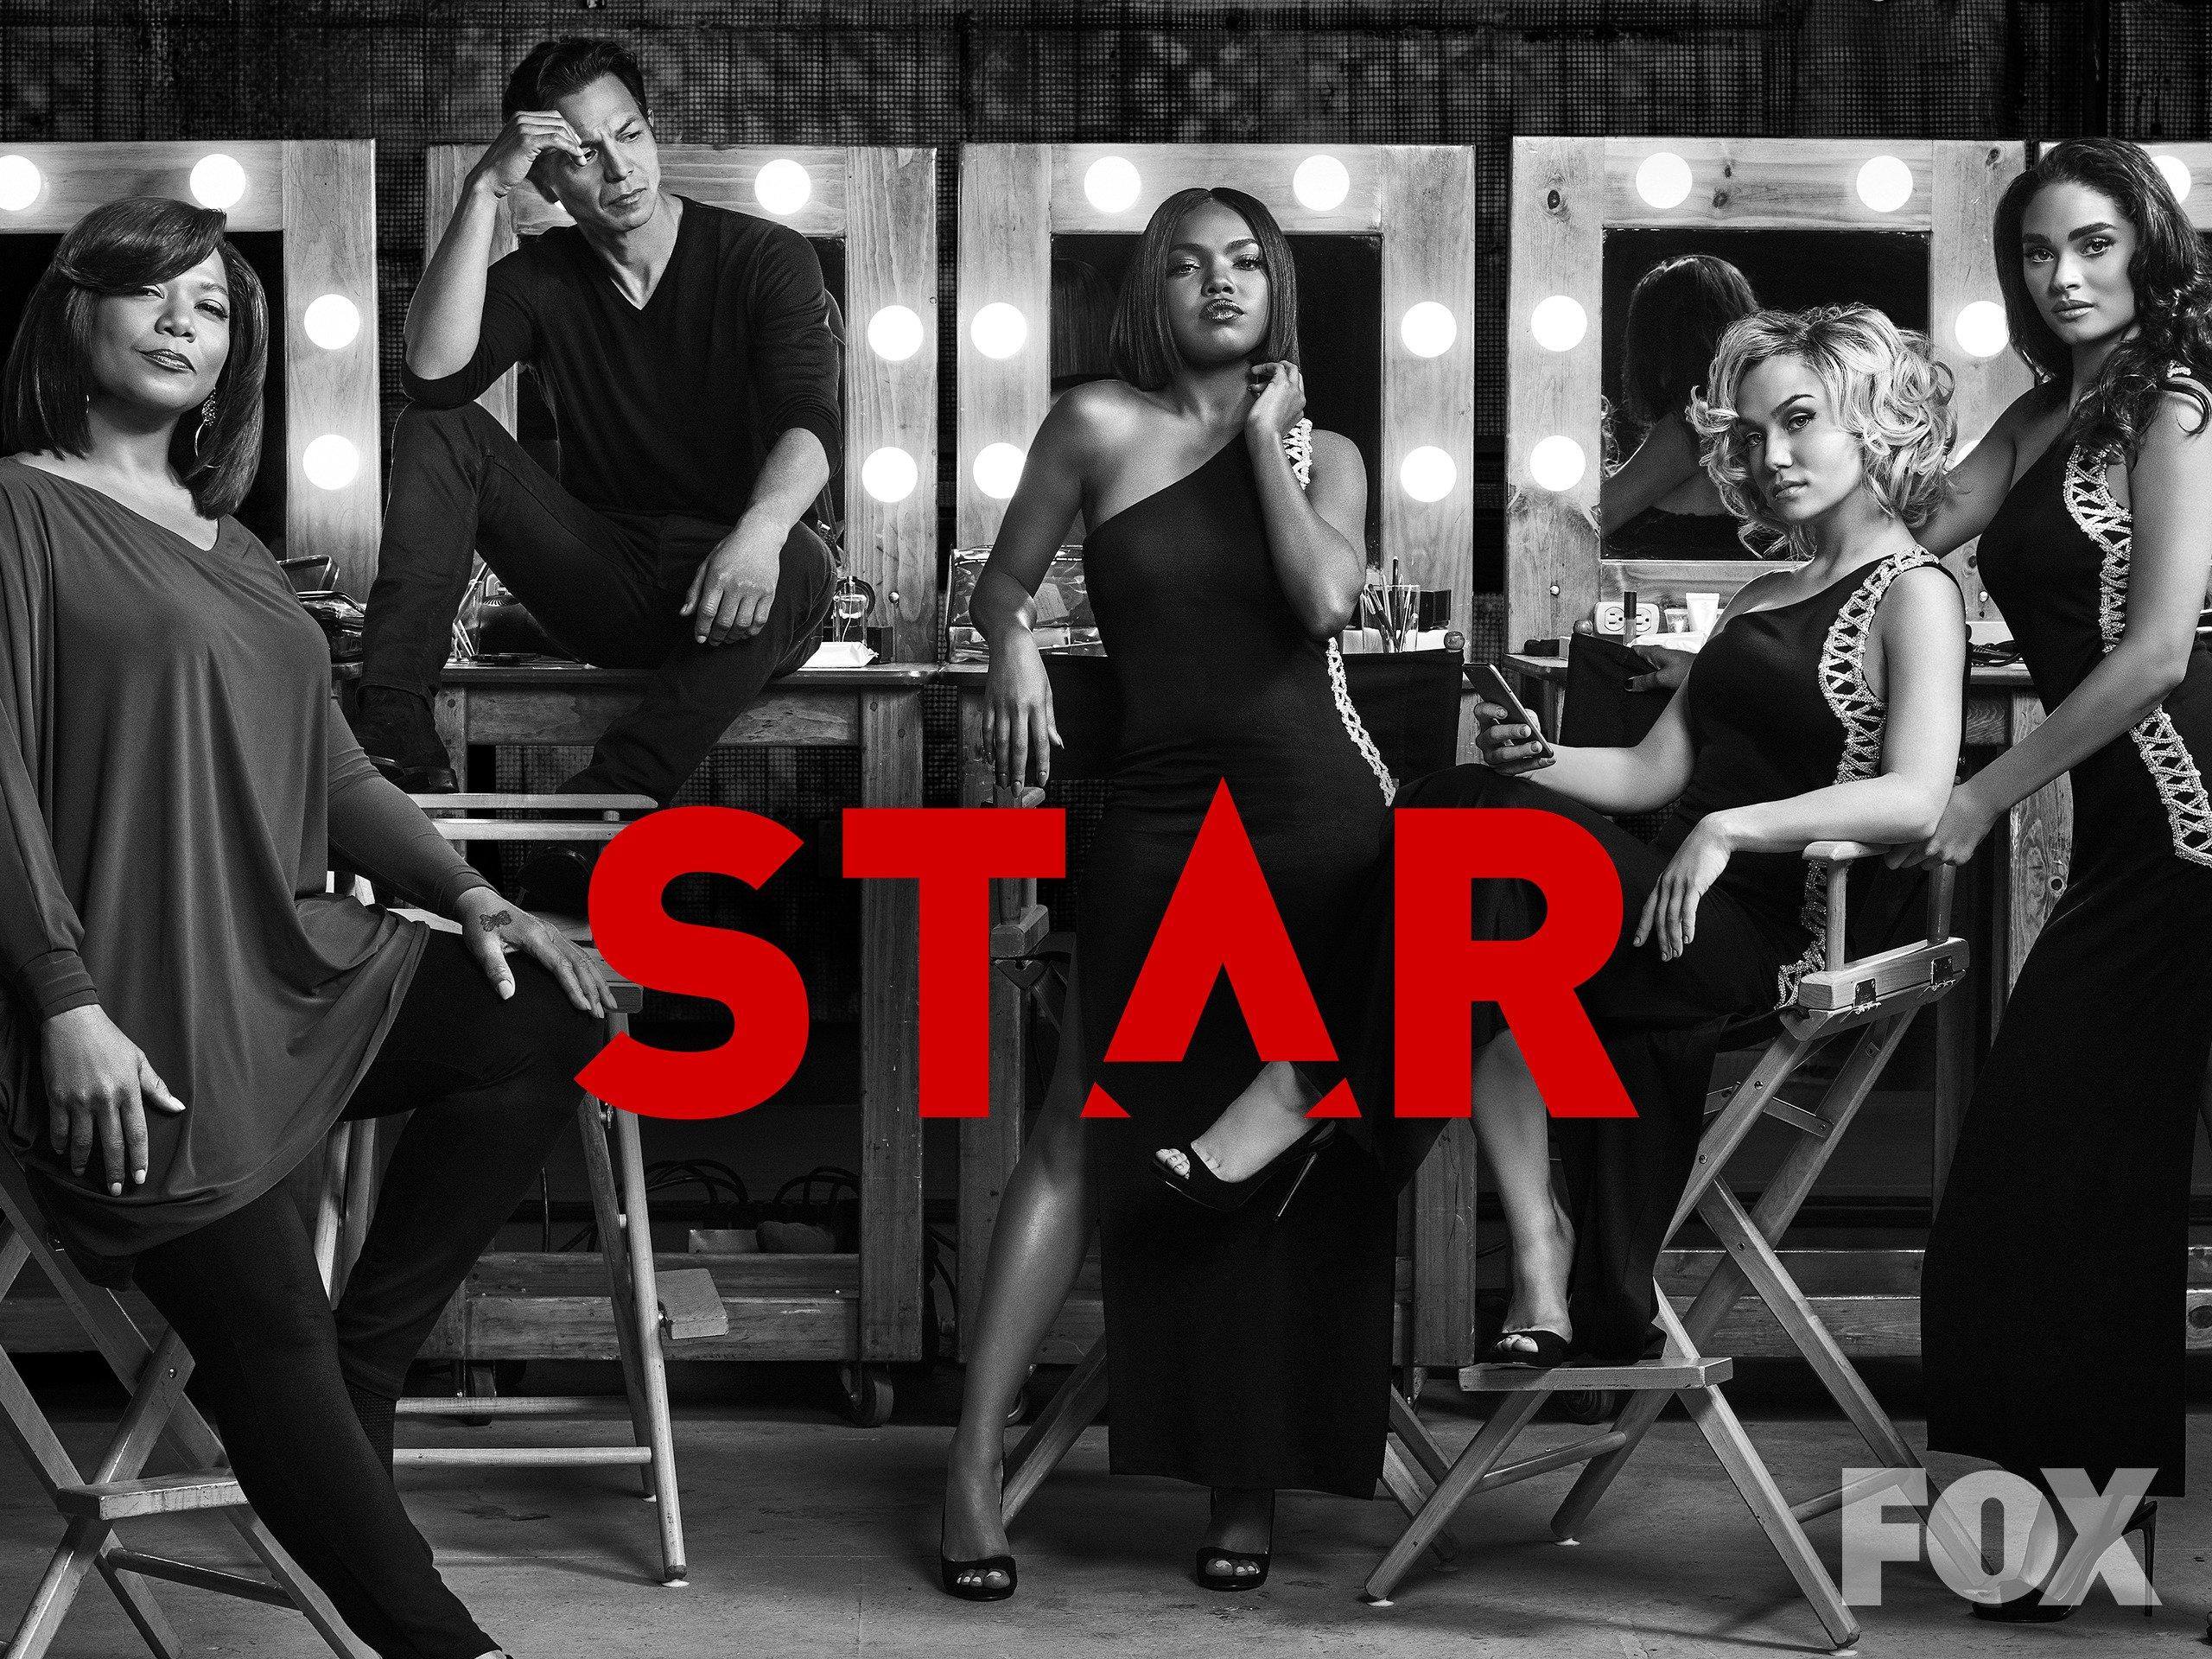 star season 2 episode 16 online free